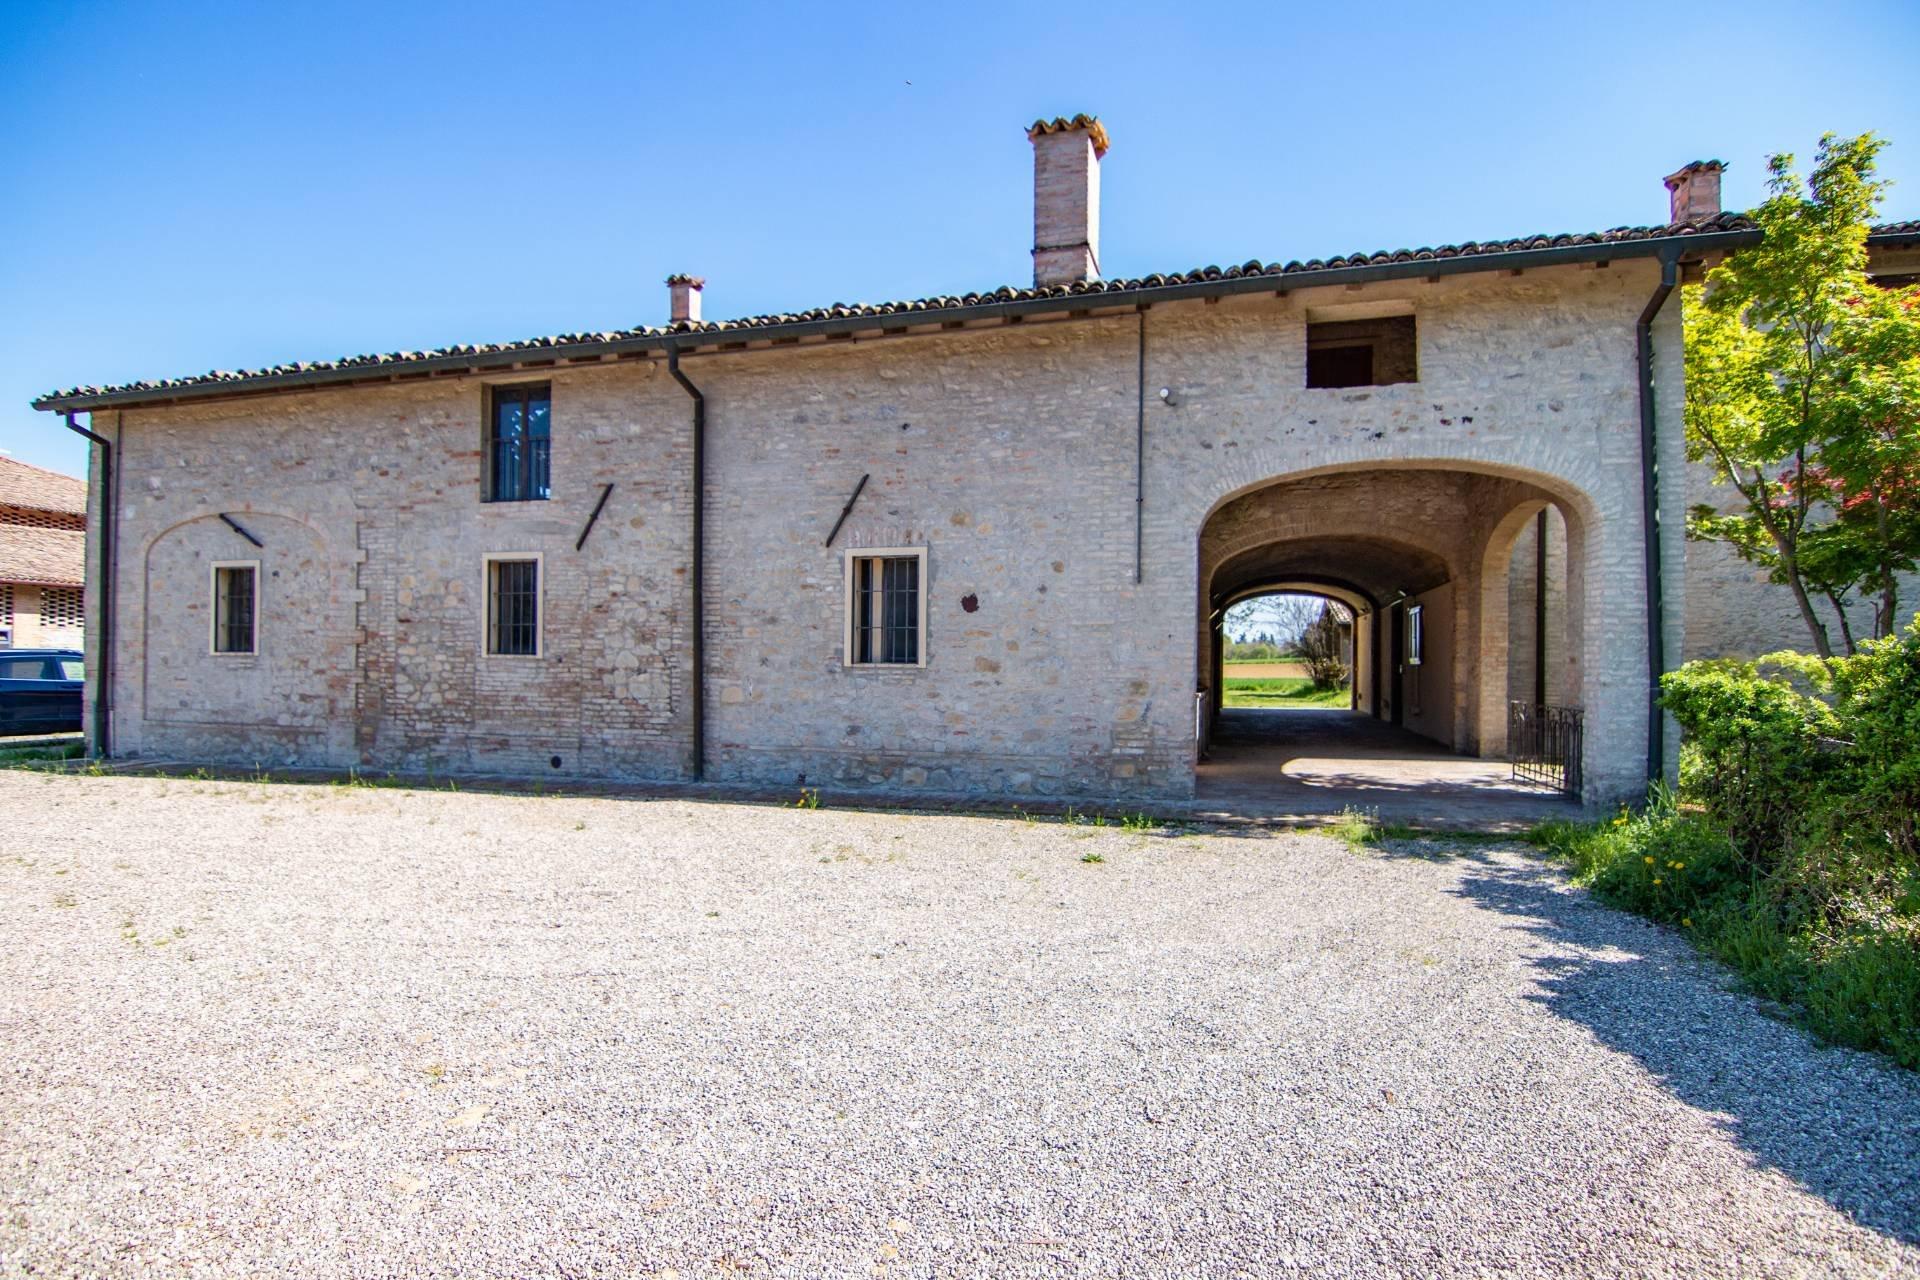 Farm Ranch in Sala Baganza, Emilia-Romagna, Italy 1